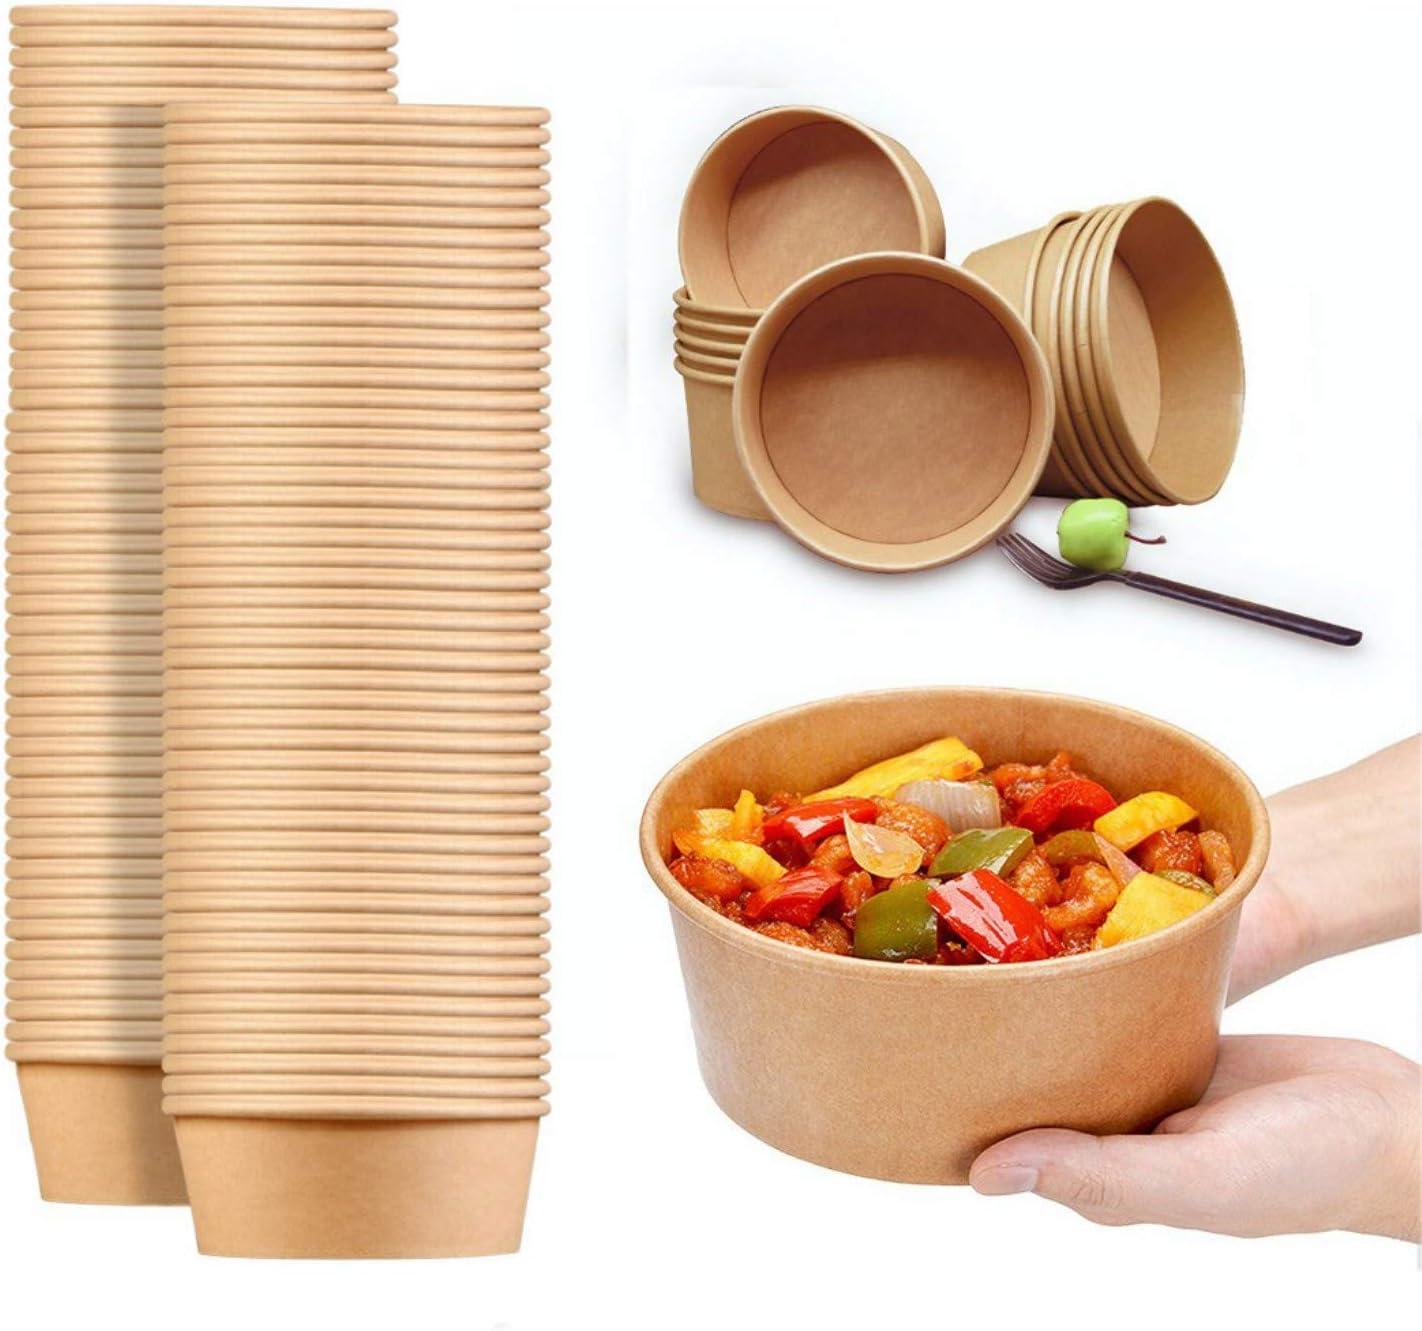 30 Oz Large Paper Bowls, 80 count Disposable Soup Bowls Plastic Free Party Supplies for Hot/Cold Food, Soup (30)